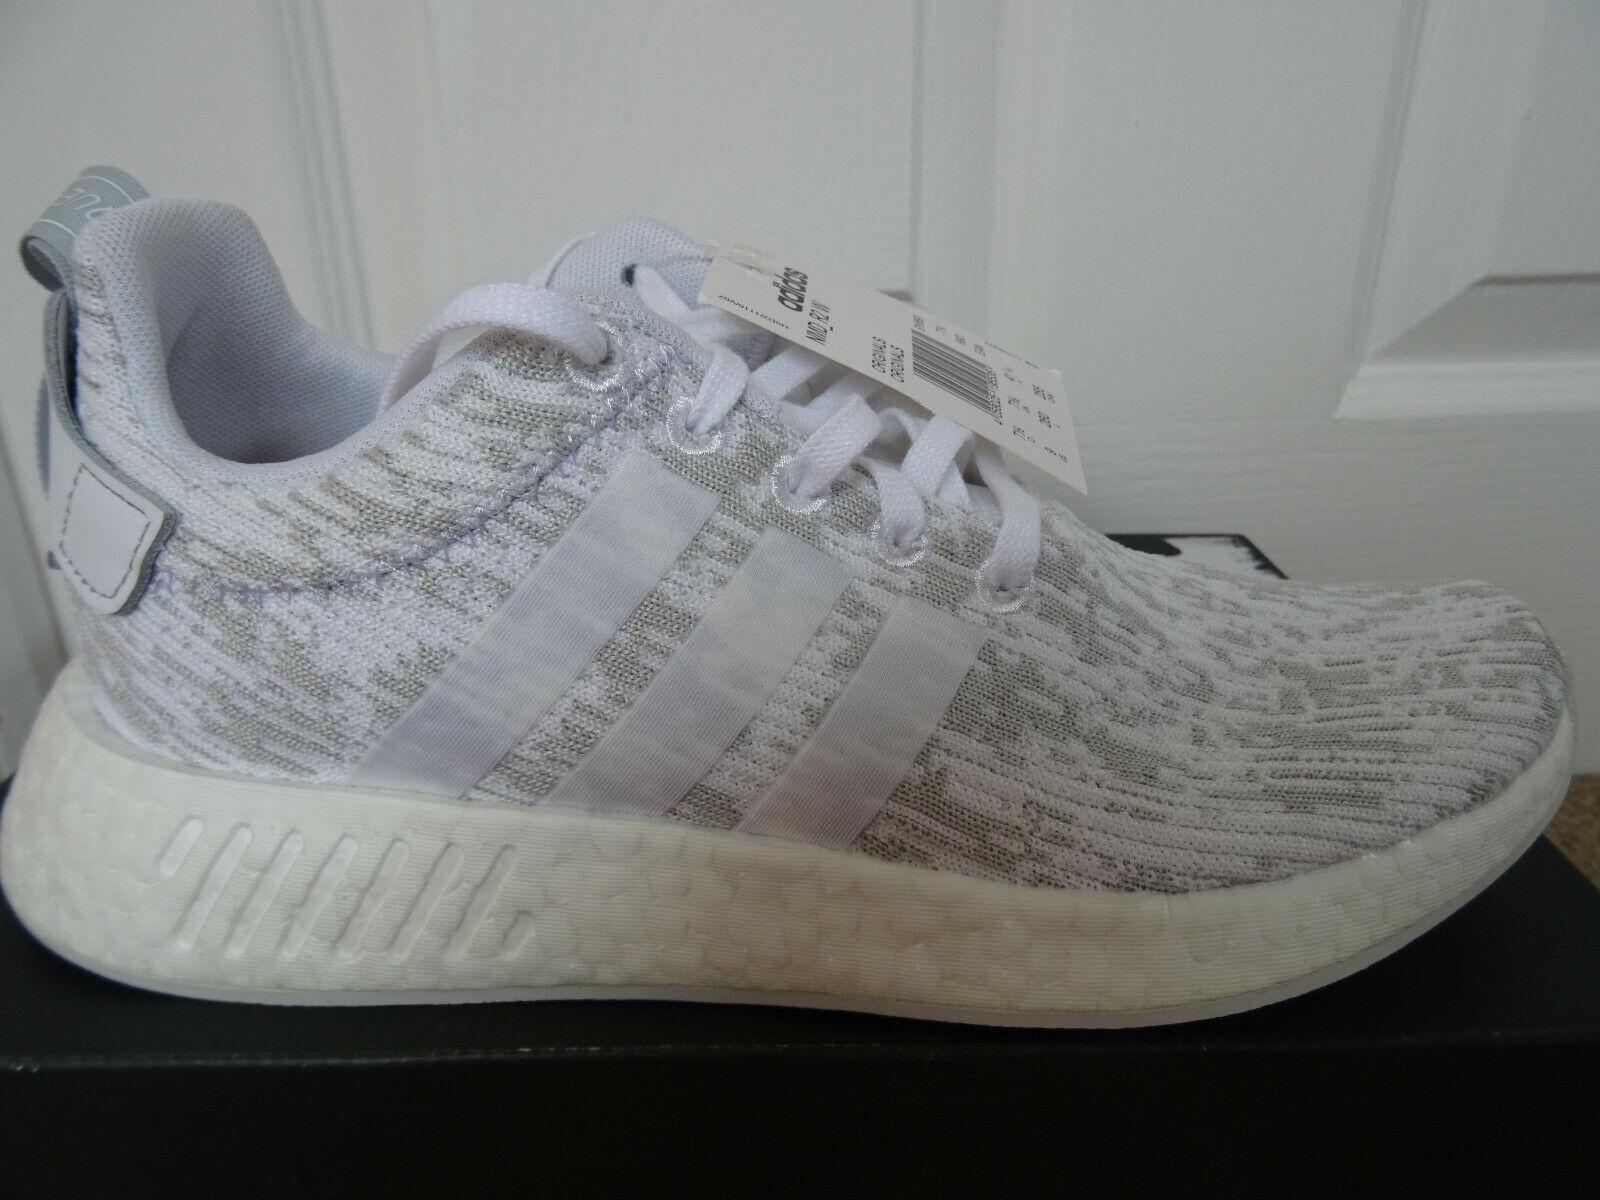 Adidas originals NMD_R2 damen trainers schuhe BY8691 uk 7.5 eu 41 1 3 us 8 NEW